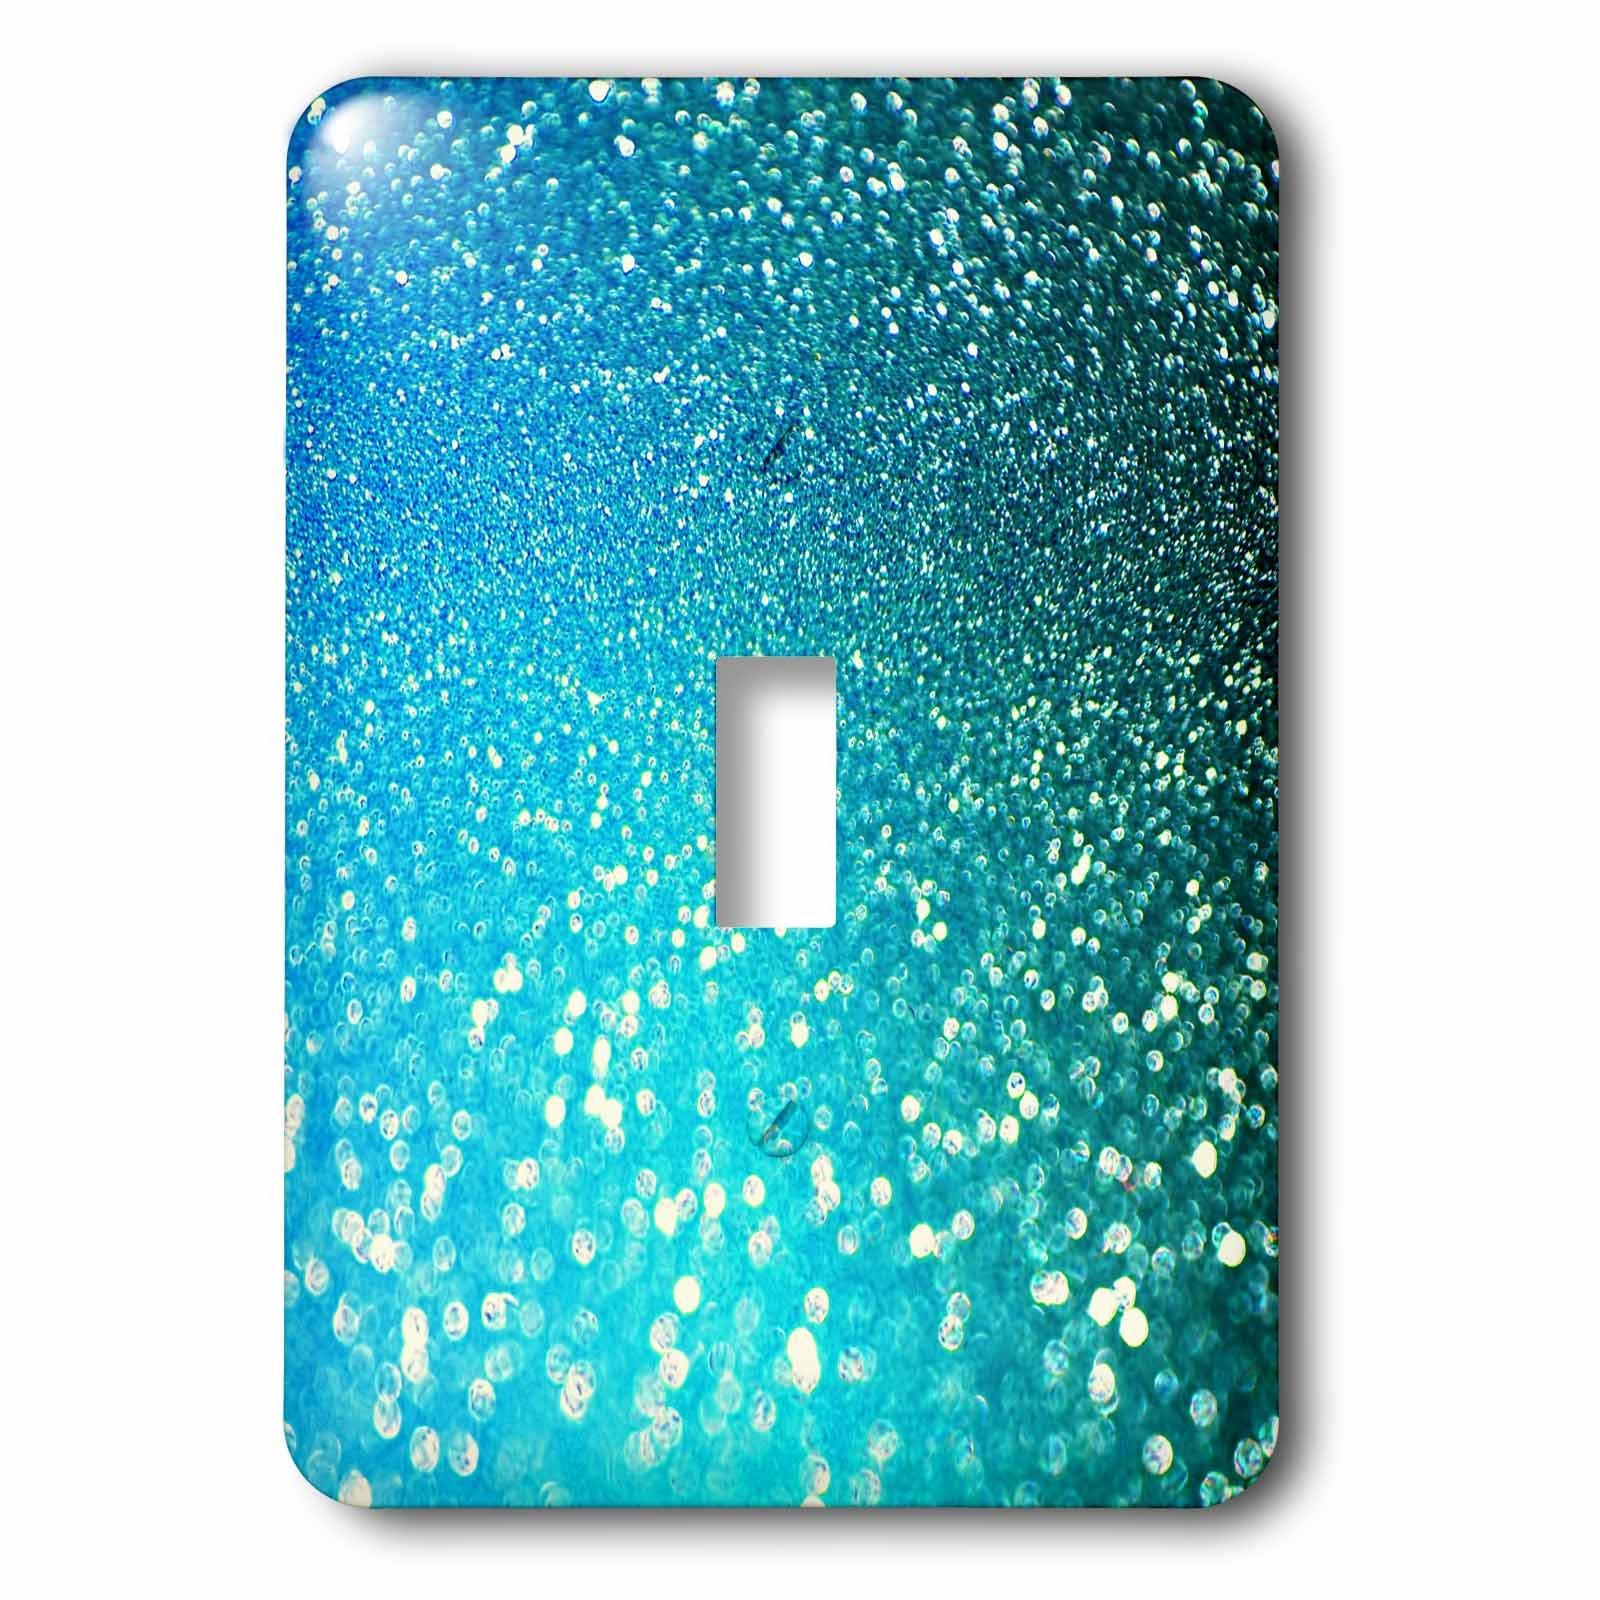 3dRose (lsp_267050_1) Single Toggle Switch (1) Sparkling Luxury Elegant Aqua Teal Blue Faux Glitter Effect Artprint